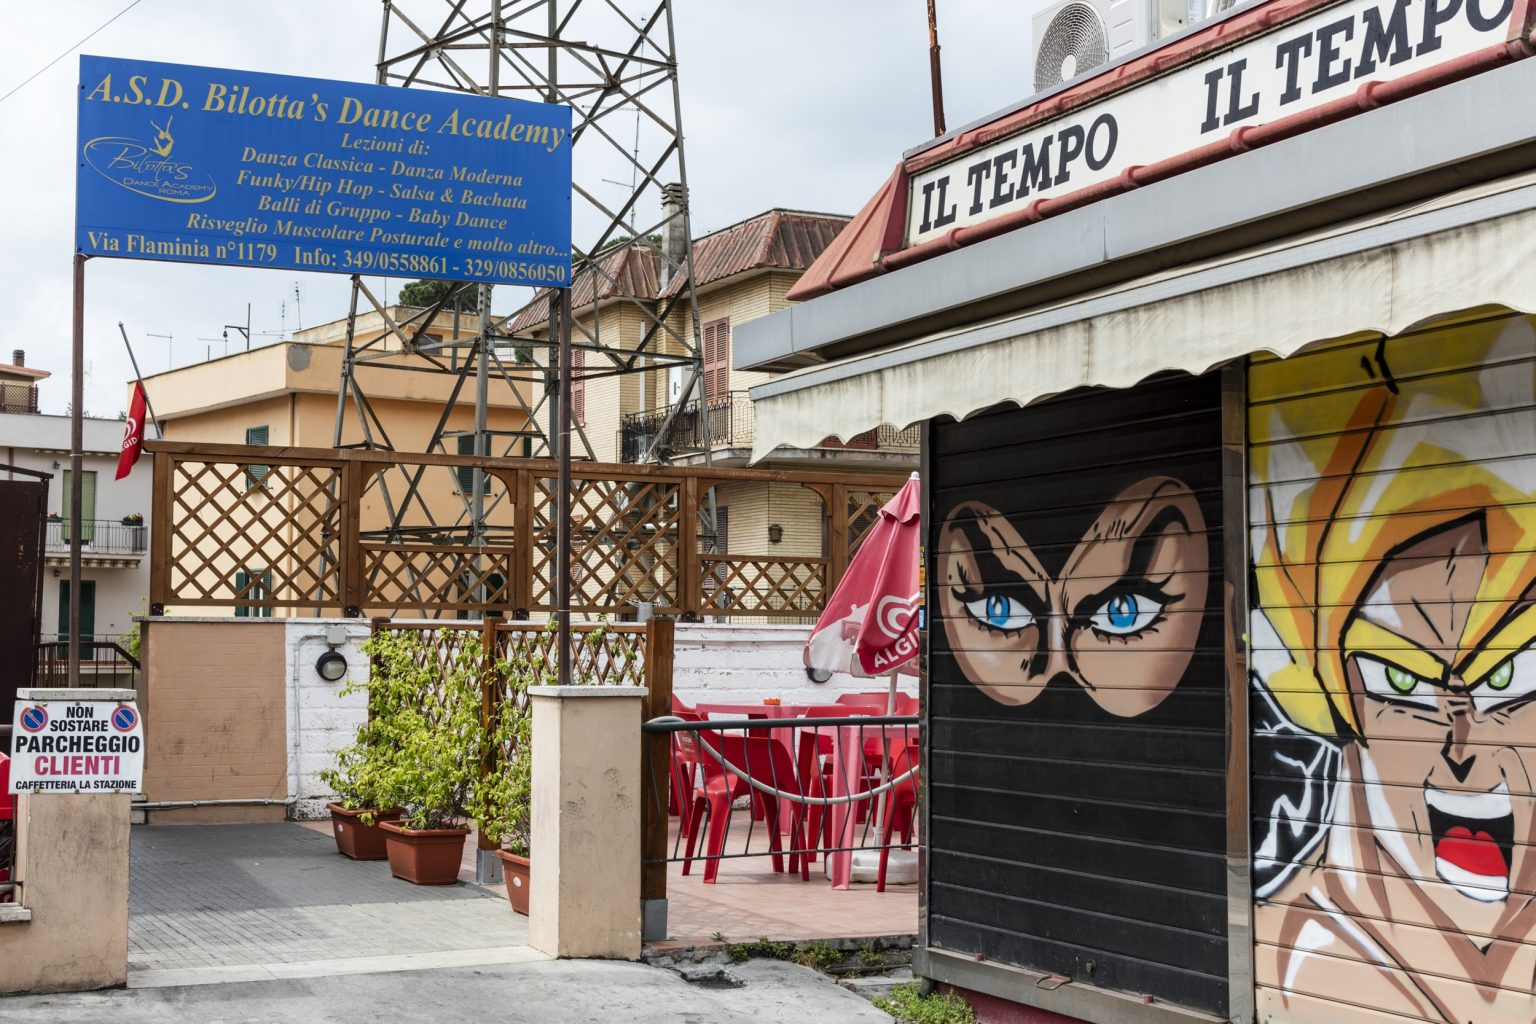 Rome, April 2016 - Settebagni district. >< Roma, aprile 2016 - Quartiere Settebagni.